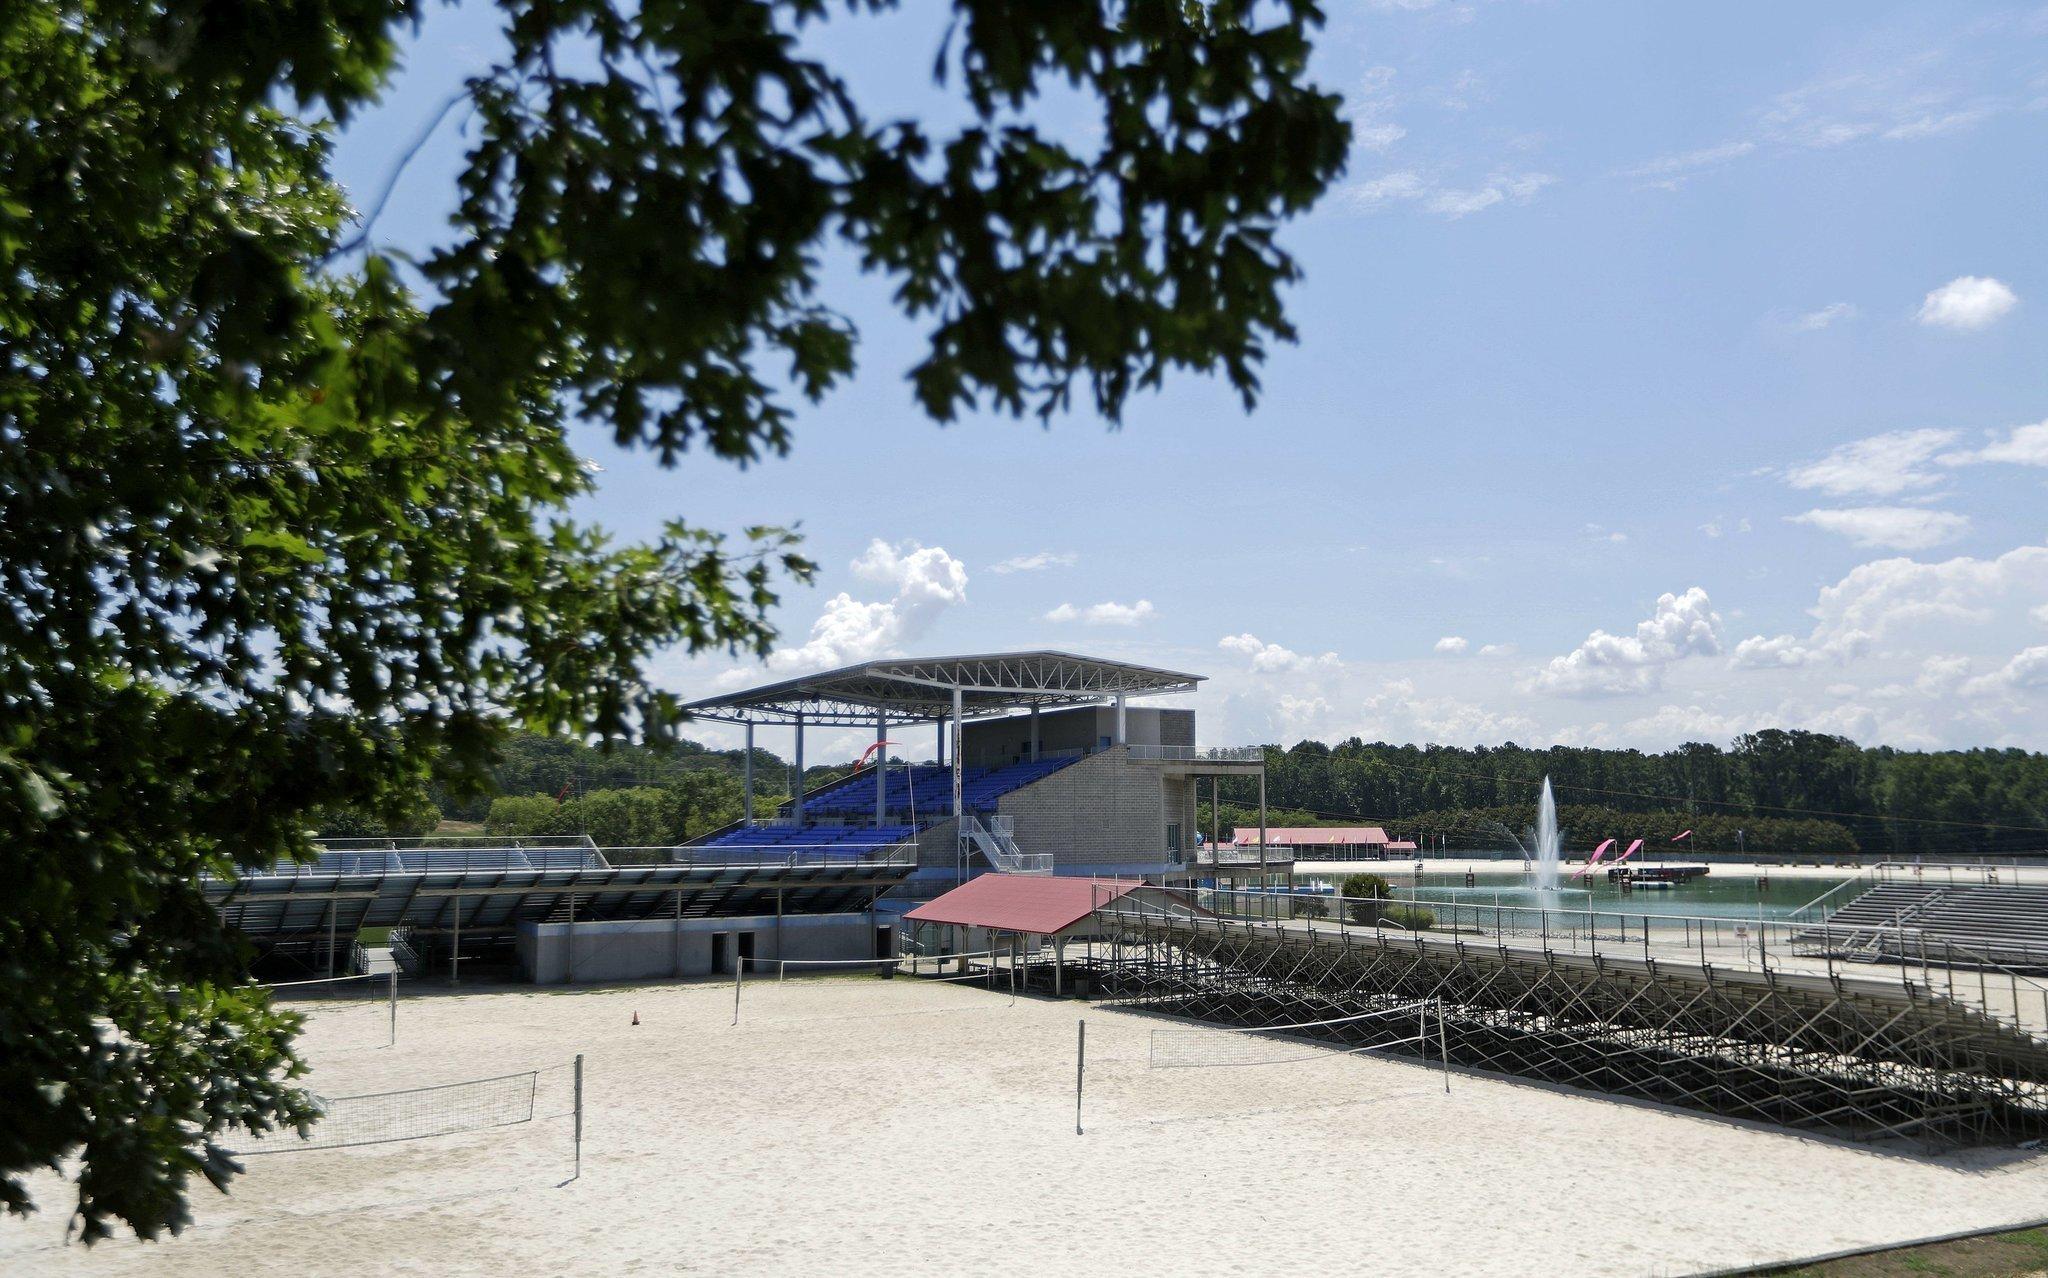 Atlanta S Olympic Venues Meet Varying Fates Since 1996 The San Go Union Tribune